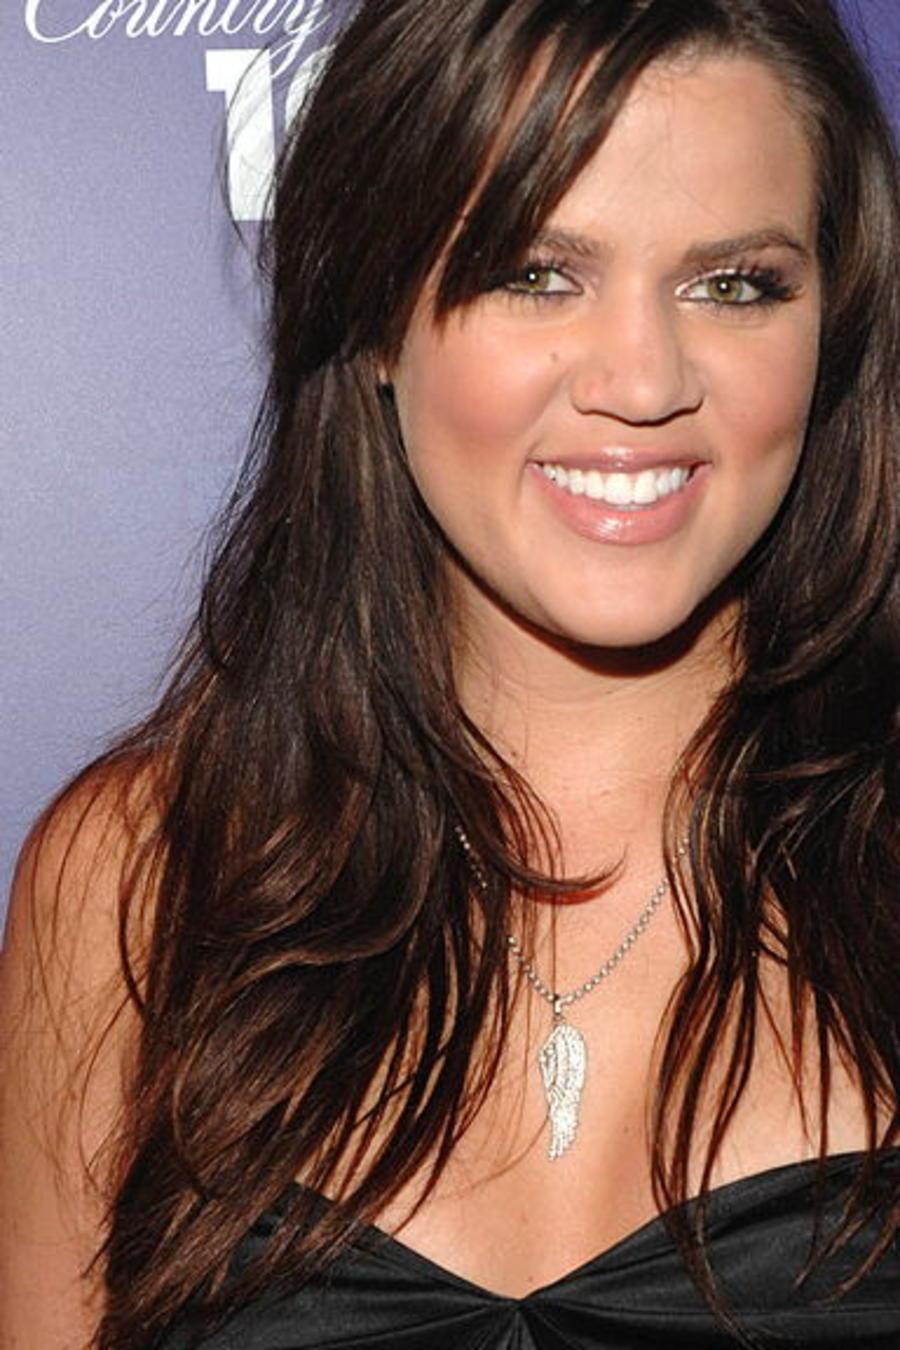 Khloé Kardashian era otra persona en 2006